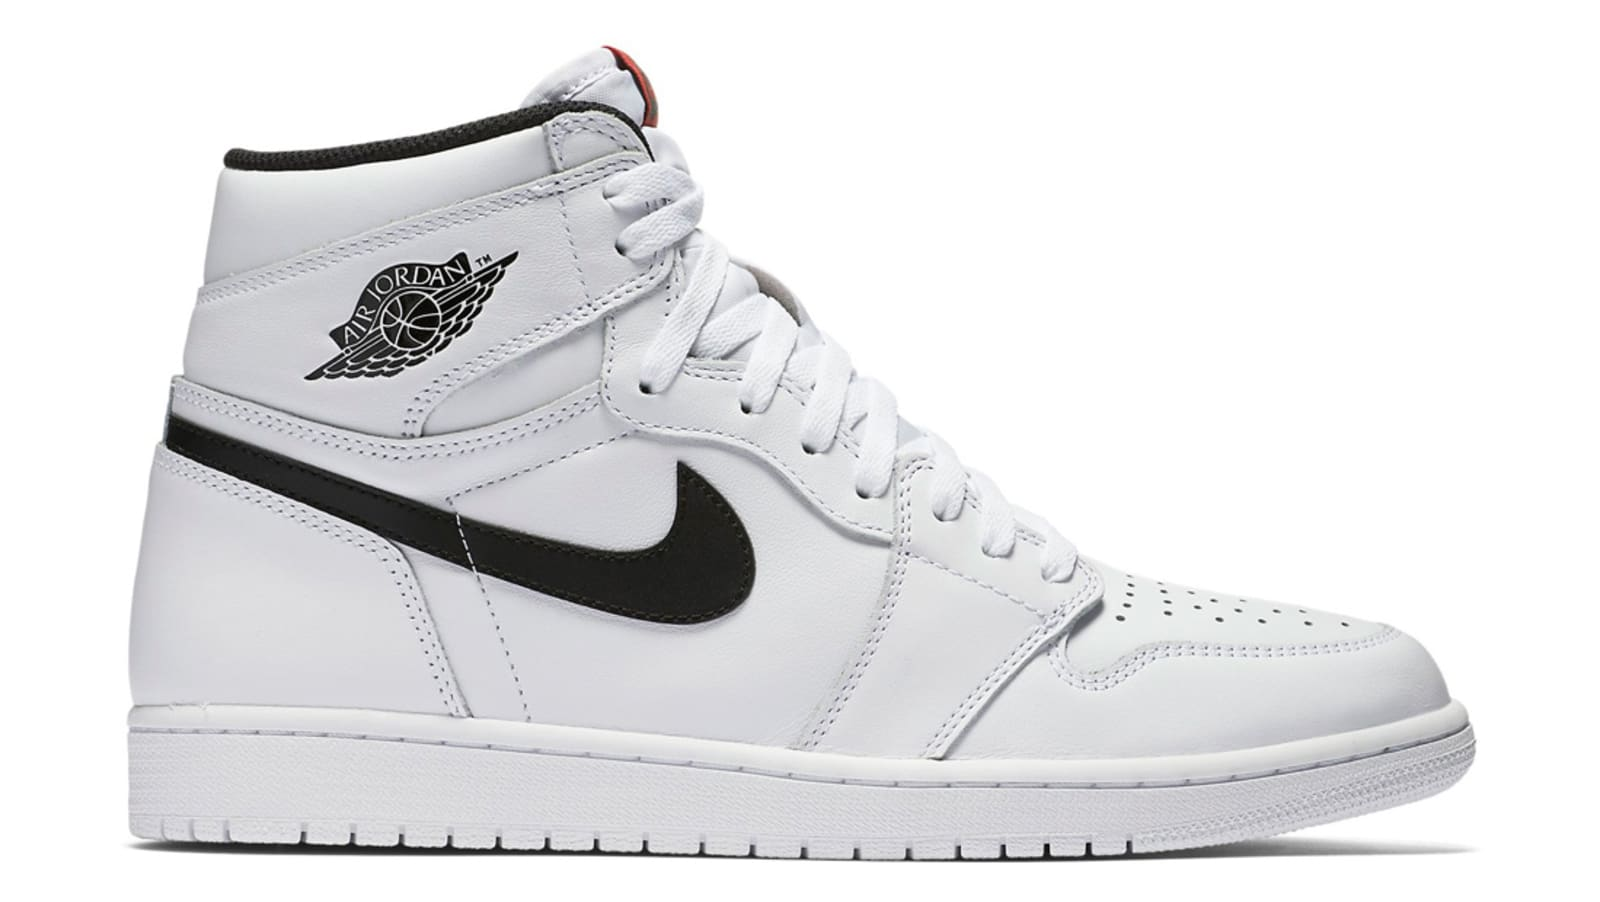 1c83f9cfd85 Nike Hyperdunk 08